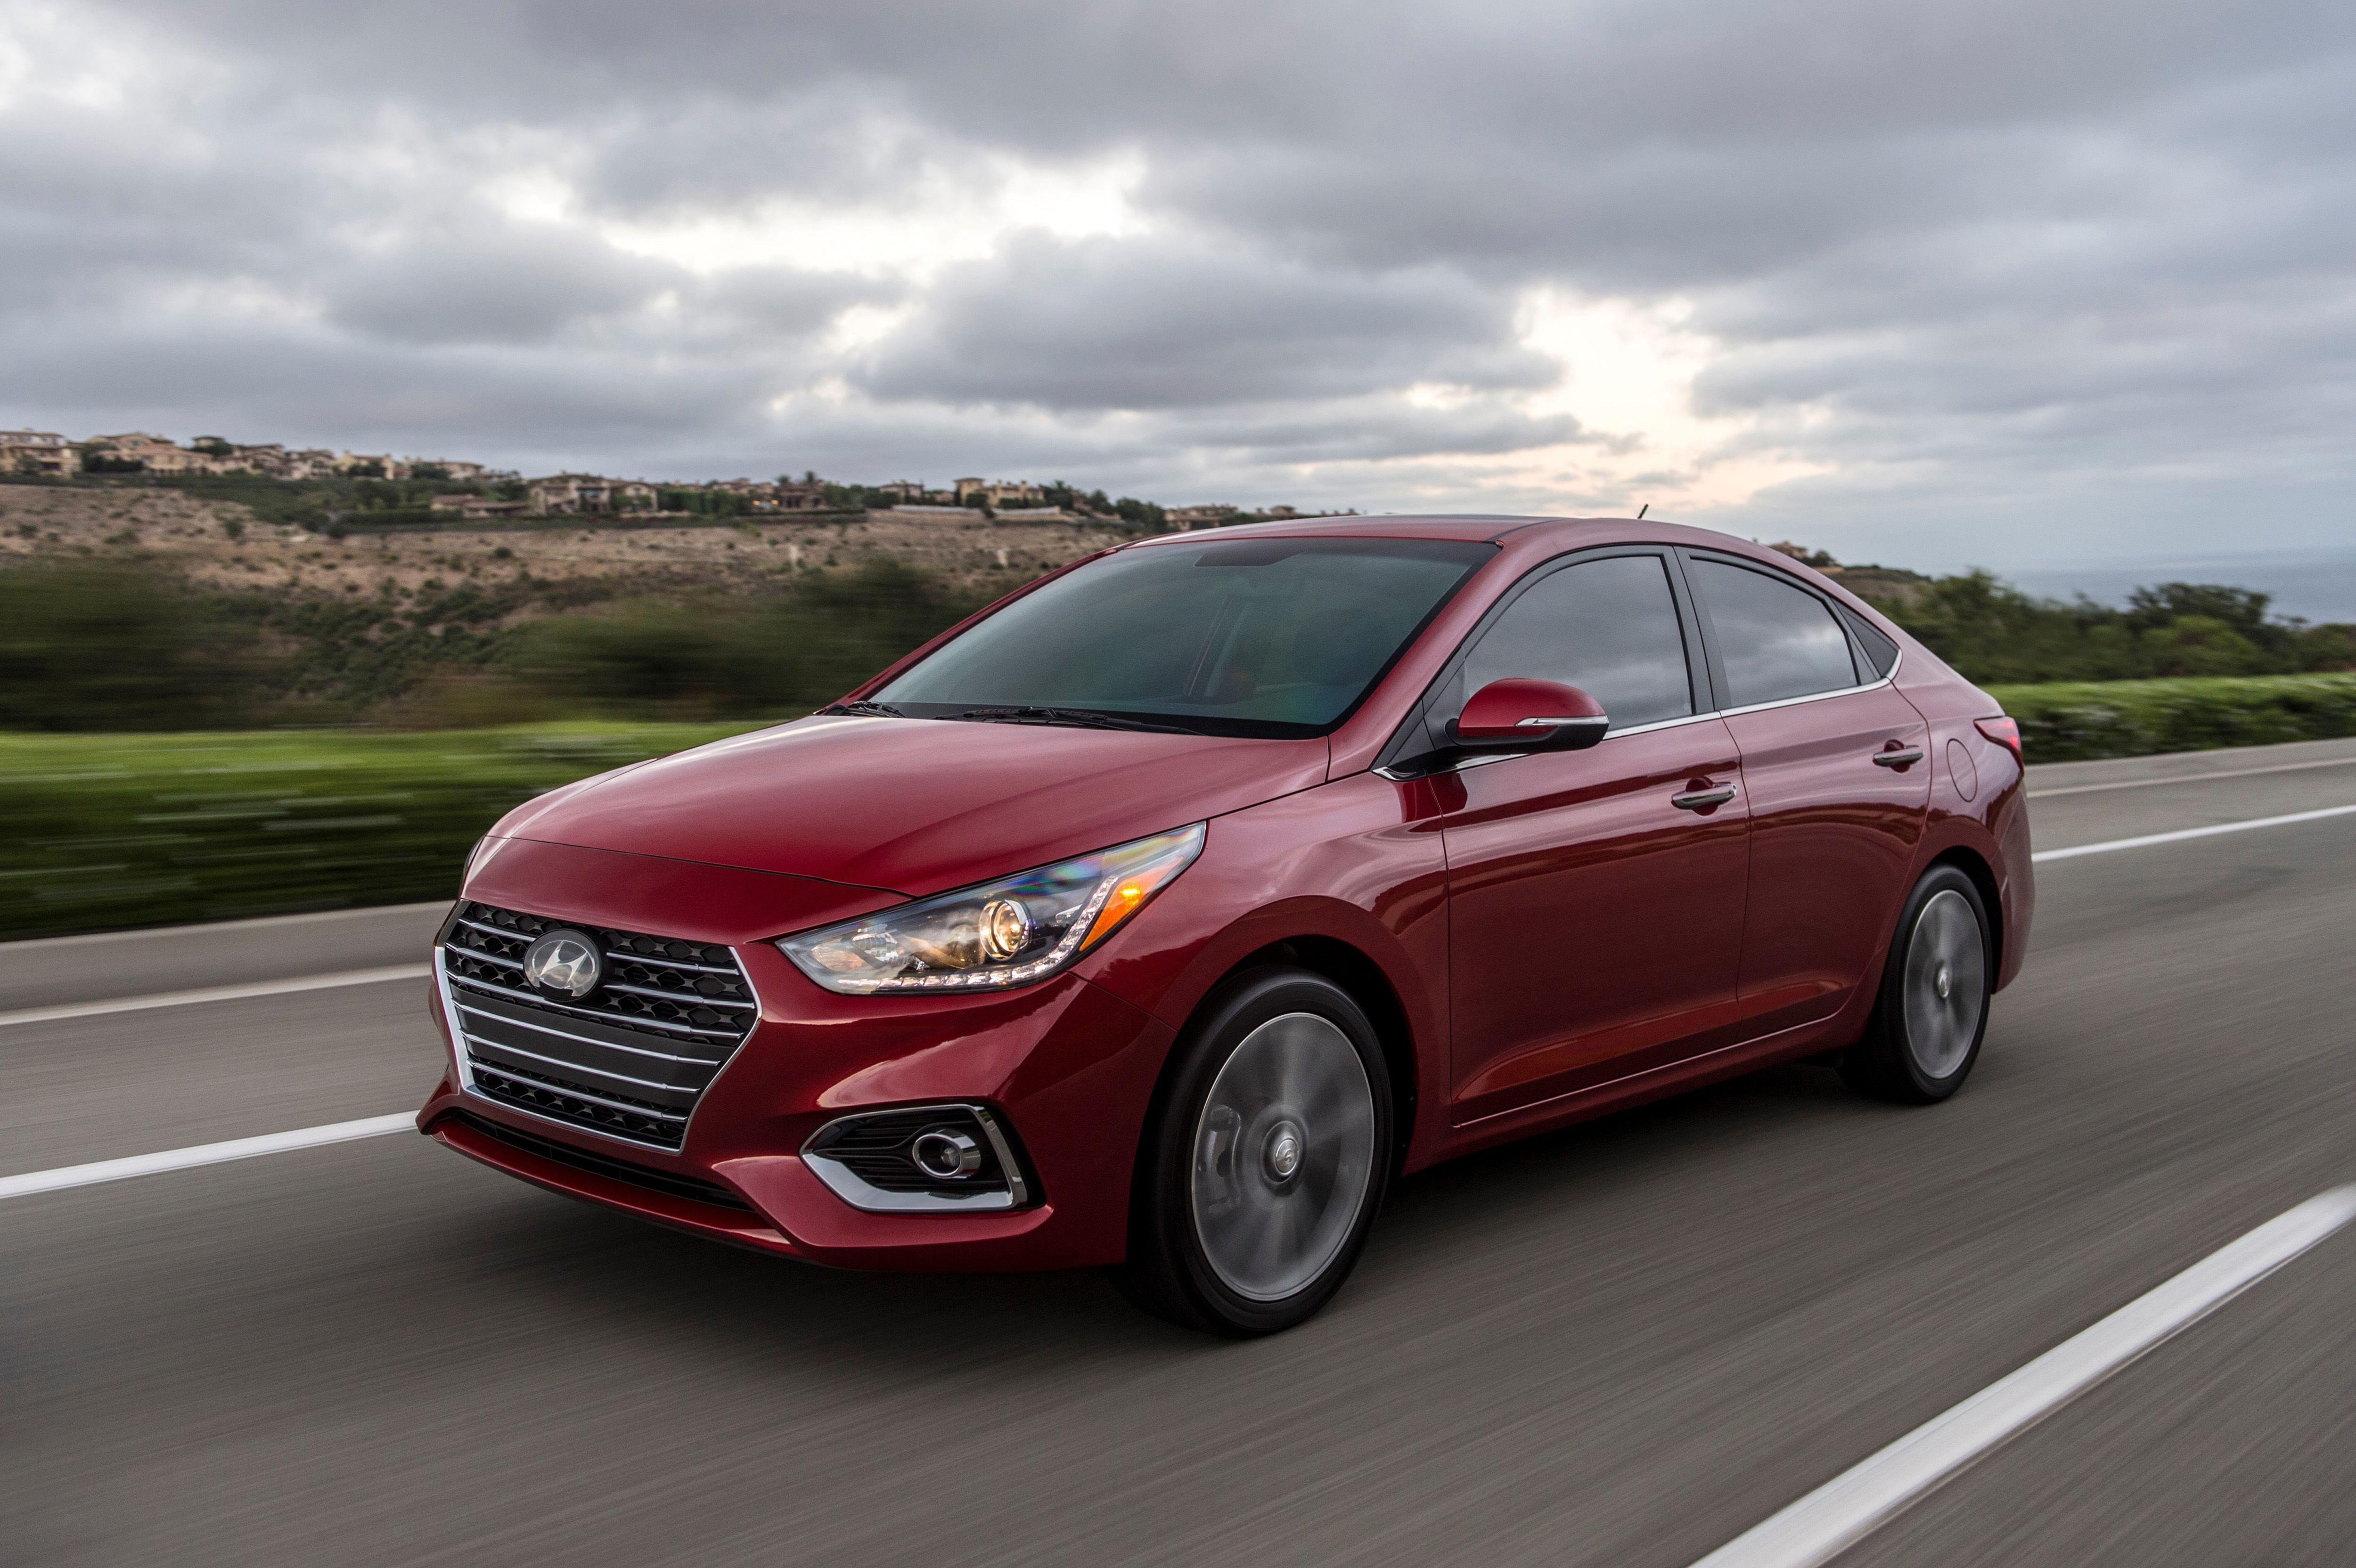 2021 Hyundai Accent Spesification